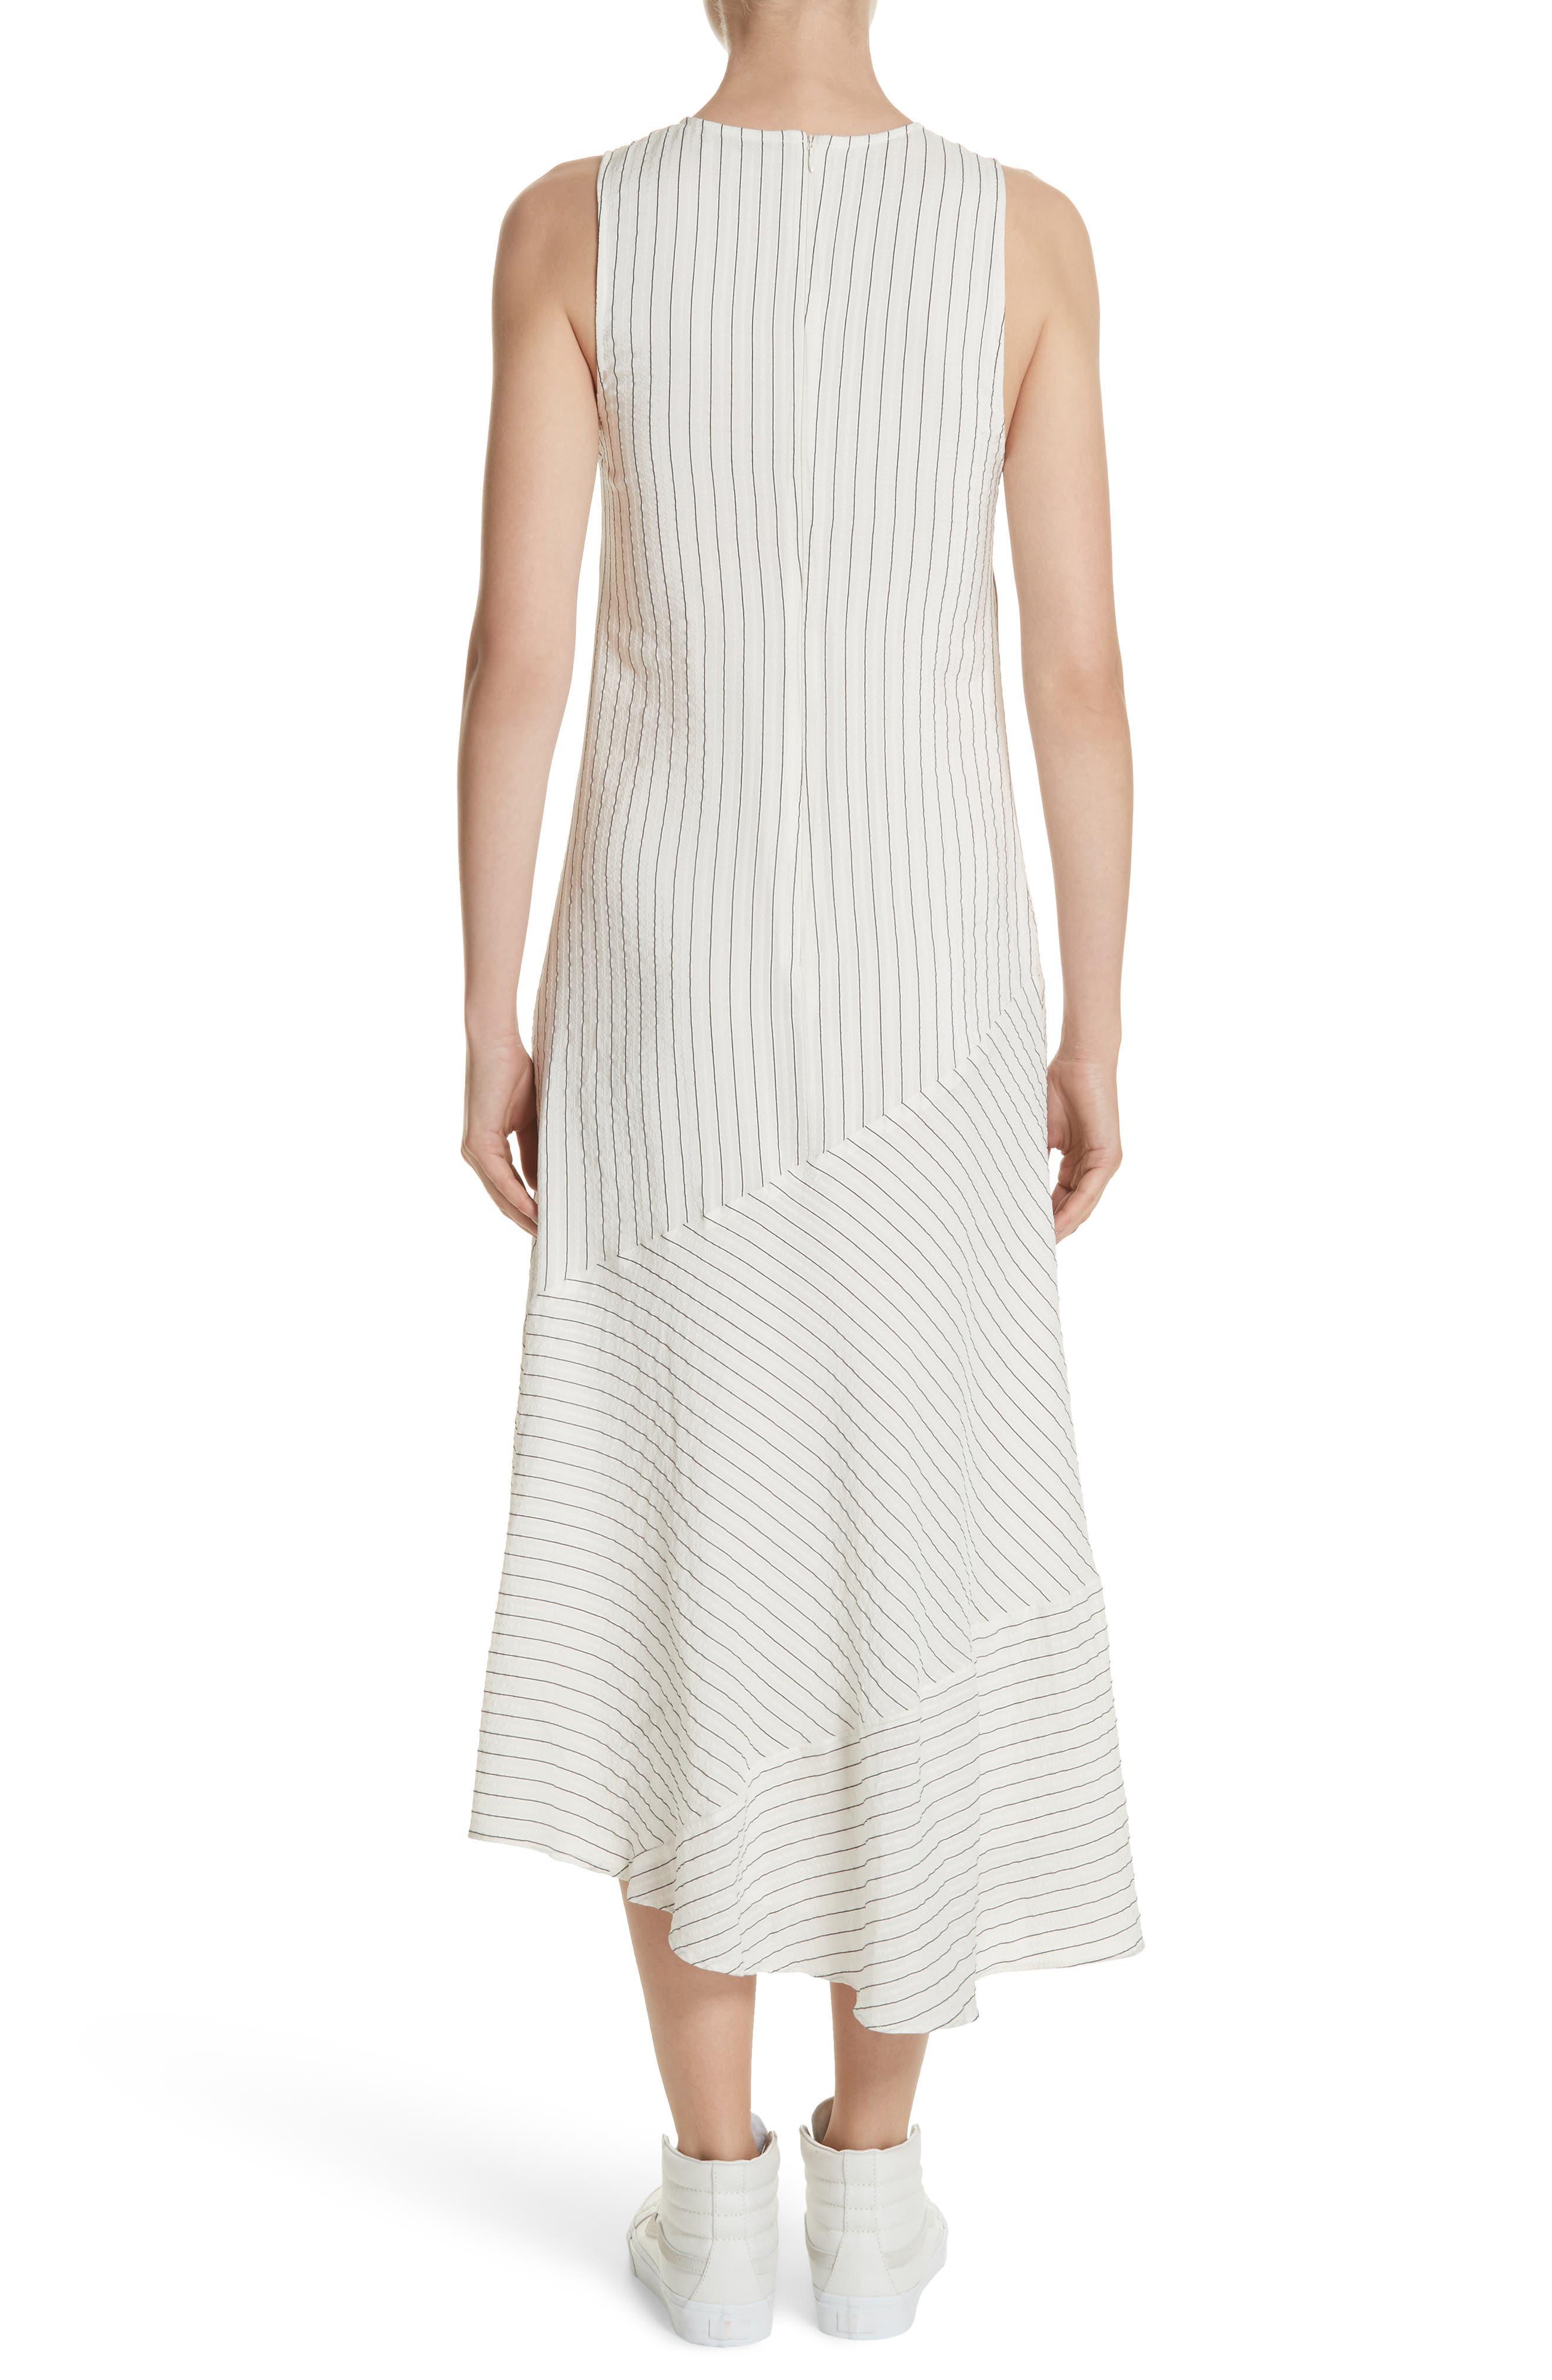 Wilkie Seersucker Striped Sheath Dress,                             Alternate thumbnail 2, color,                             Vanilla Ice